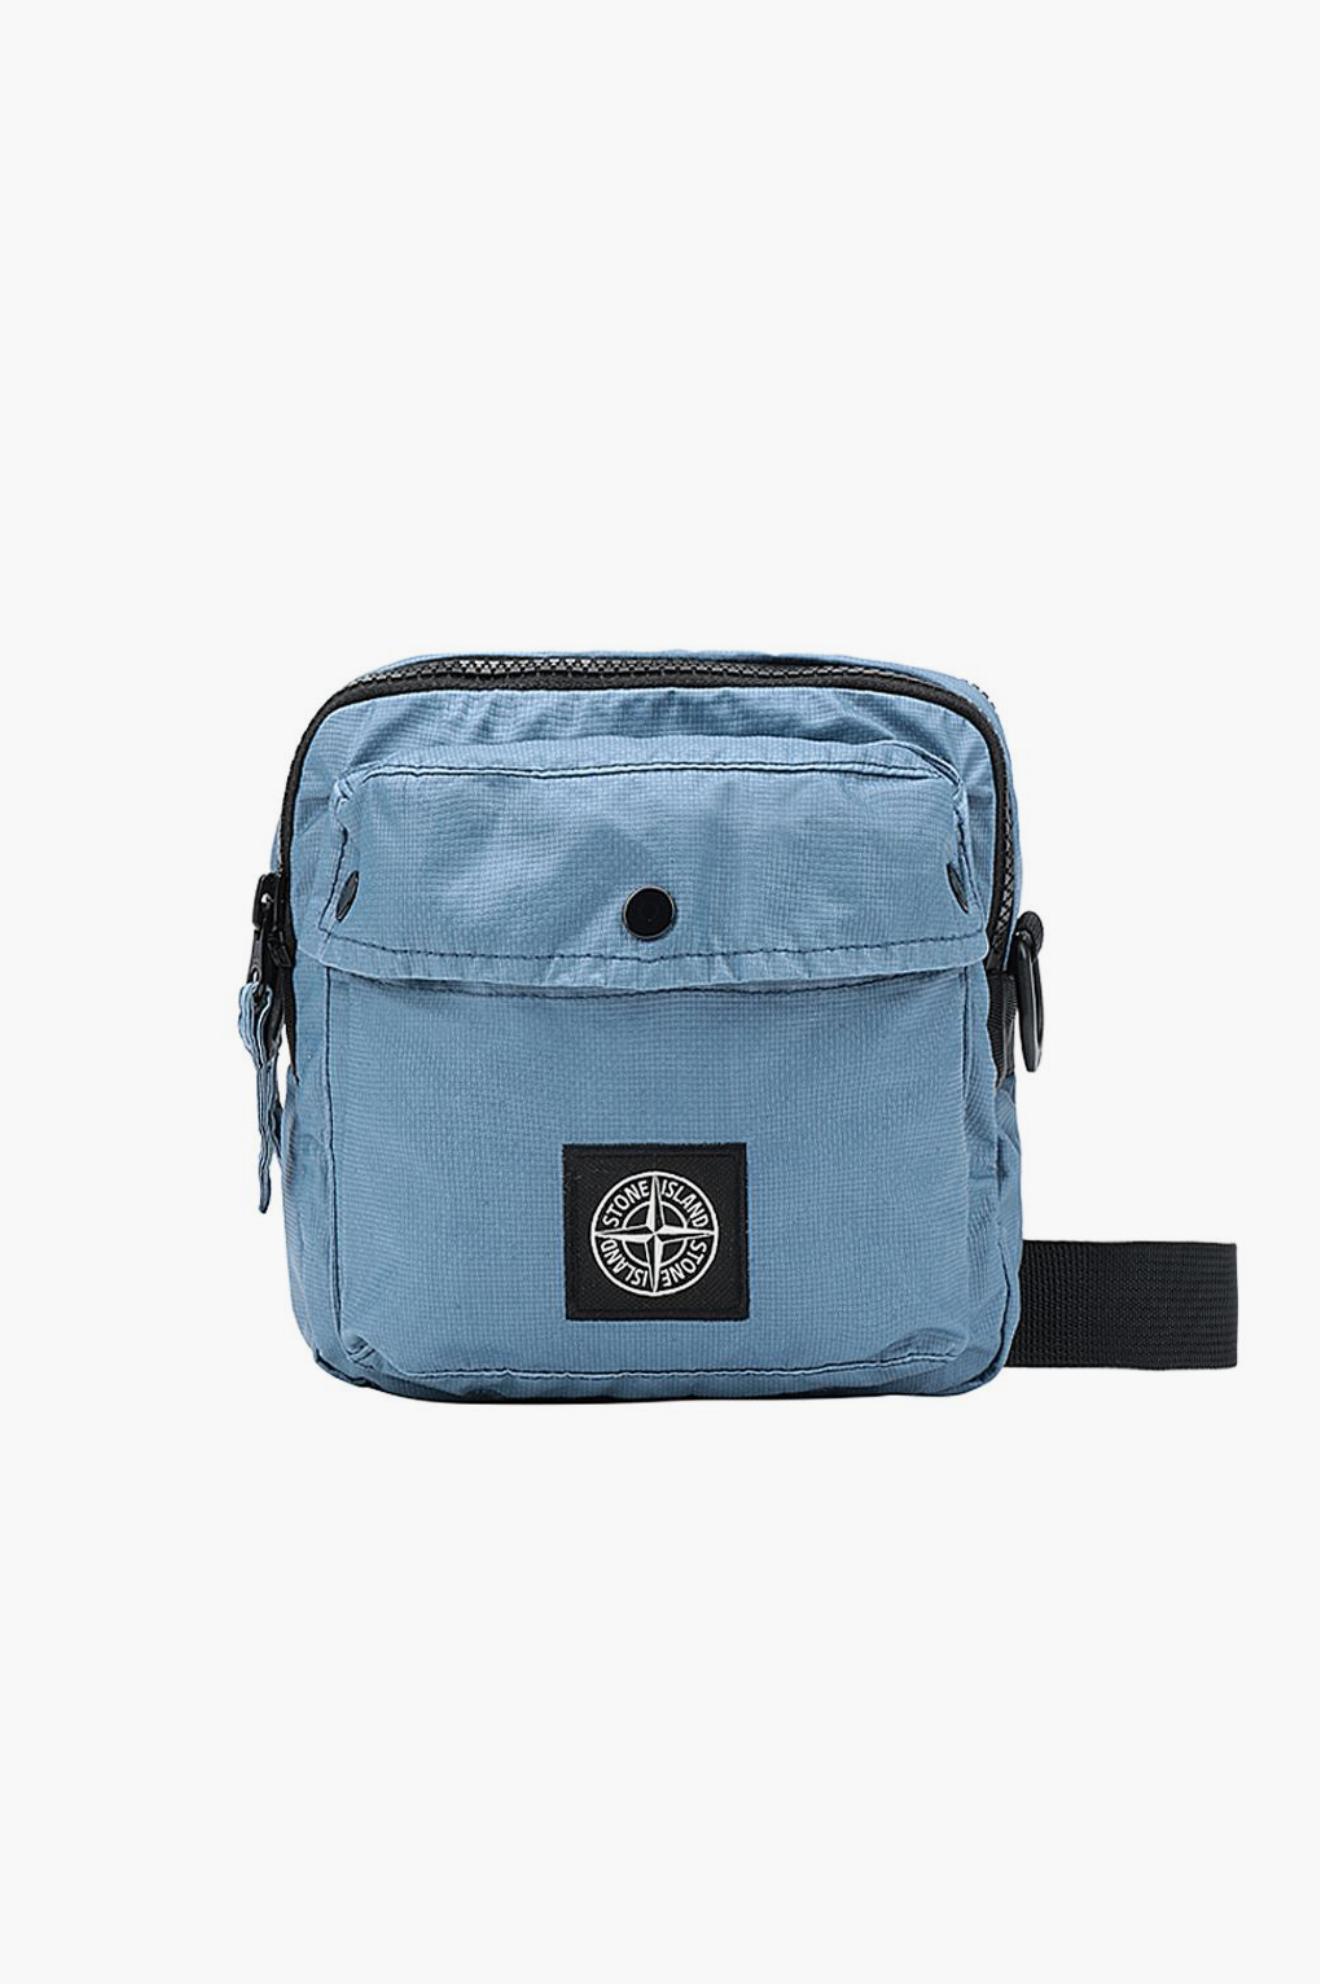 Map Bag Pastel Blue